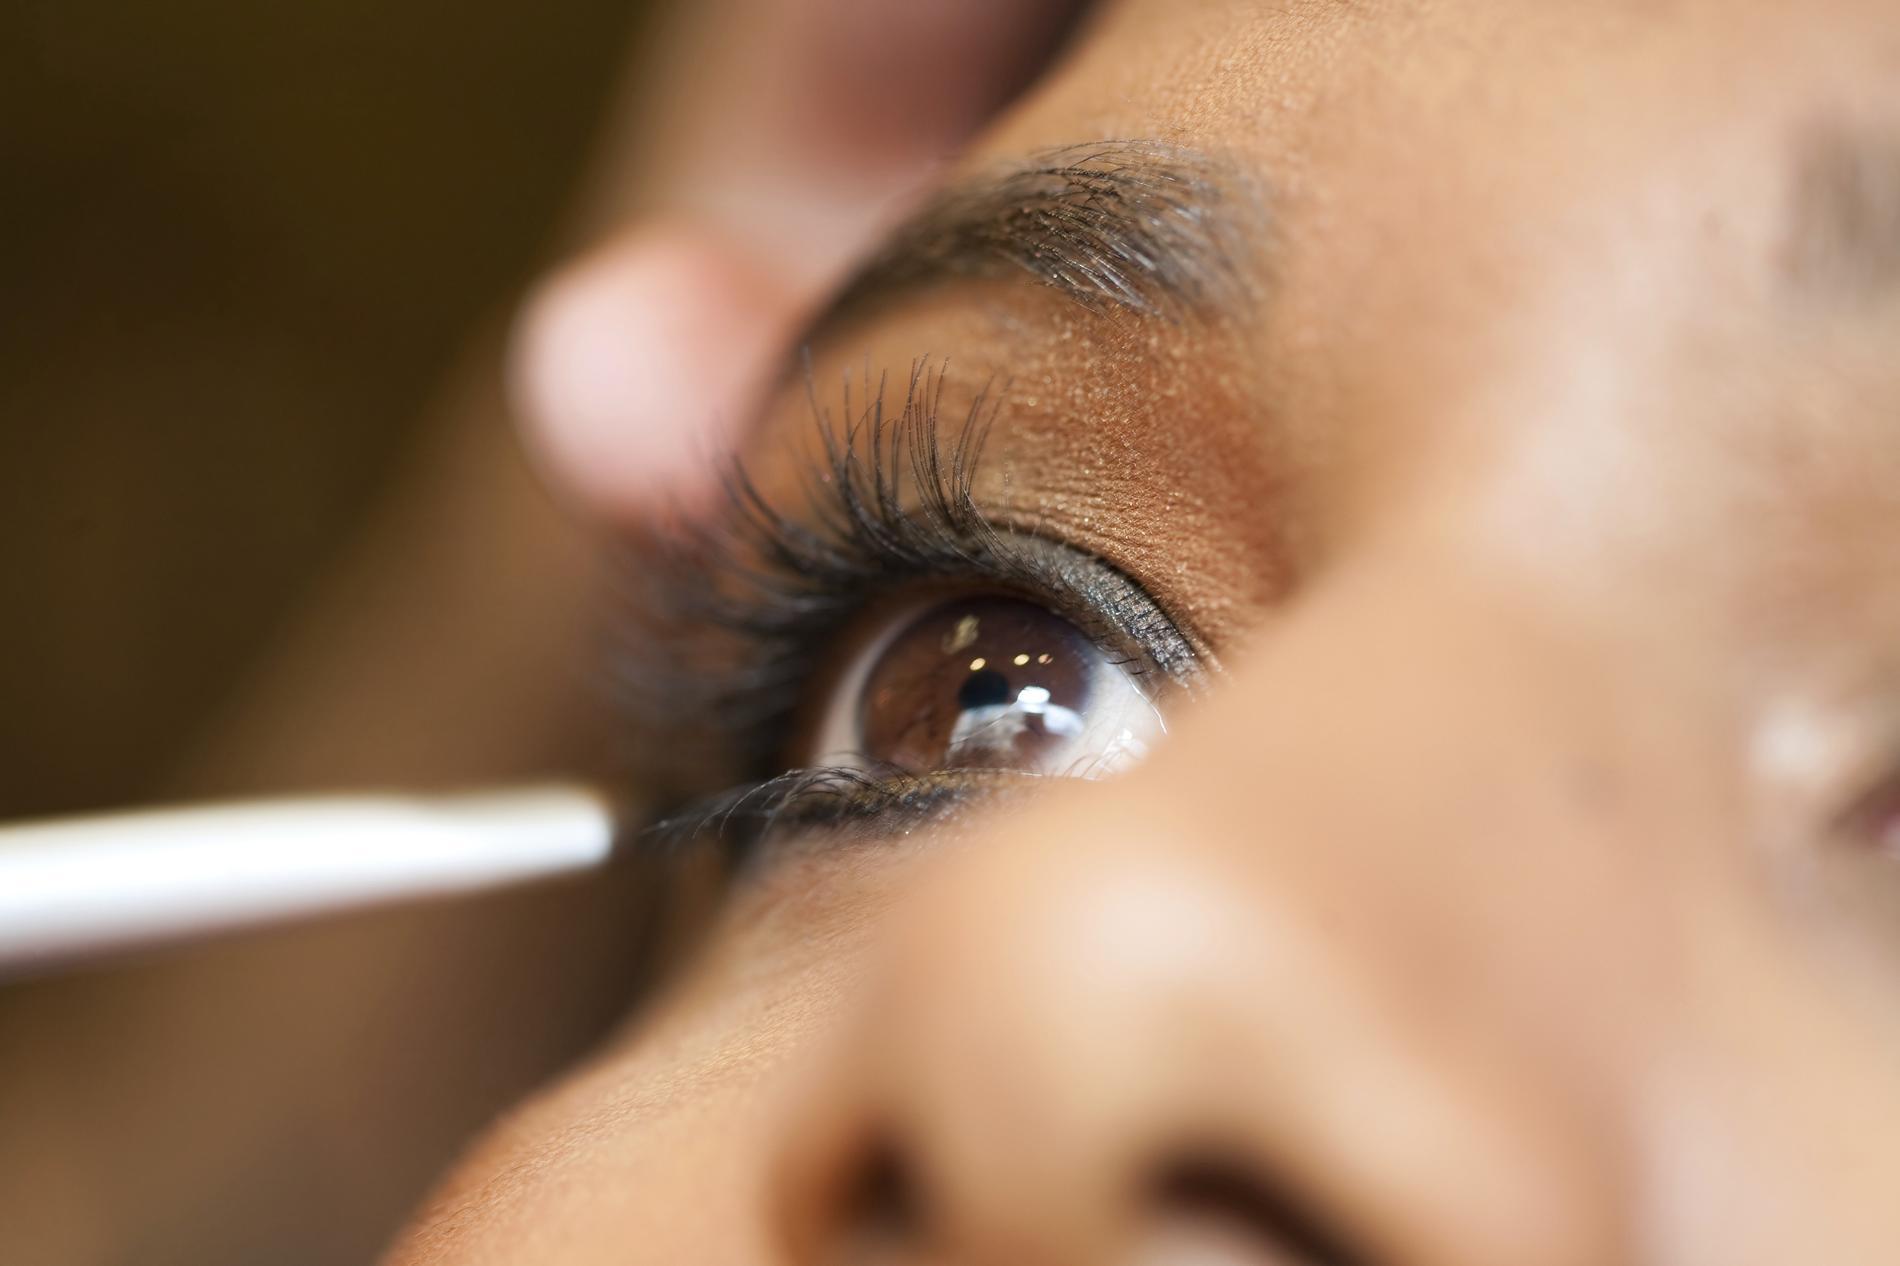 Bien connu Comment se maquiller quand on a les yeux marron - Madame Figaro EM95